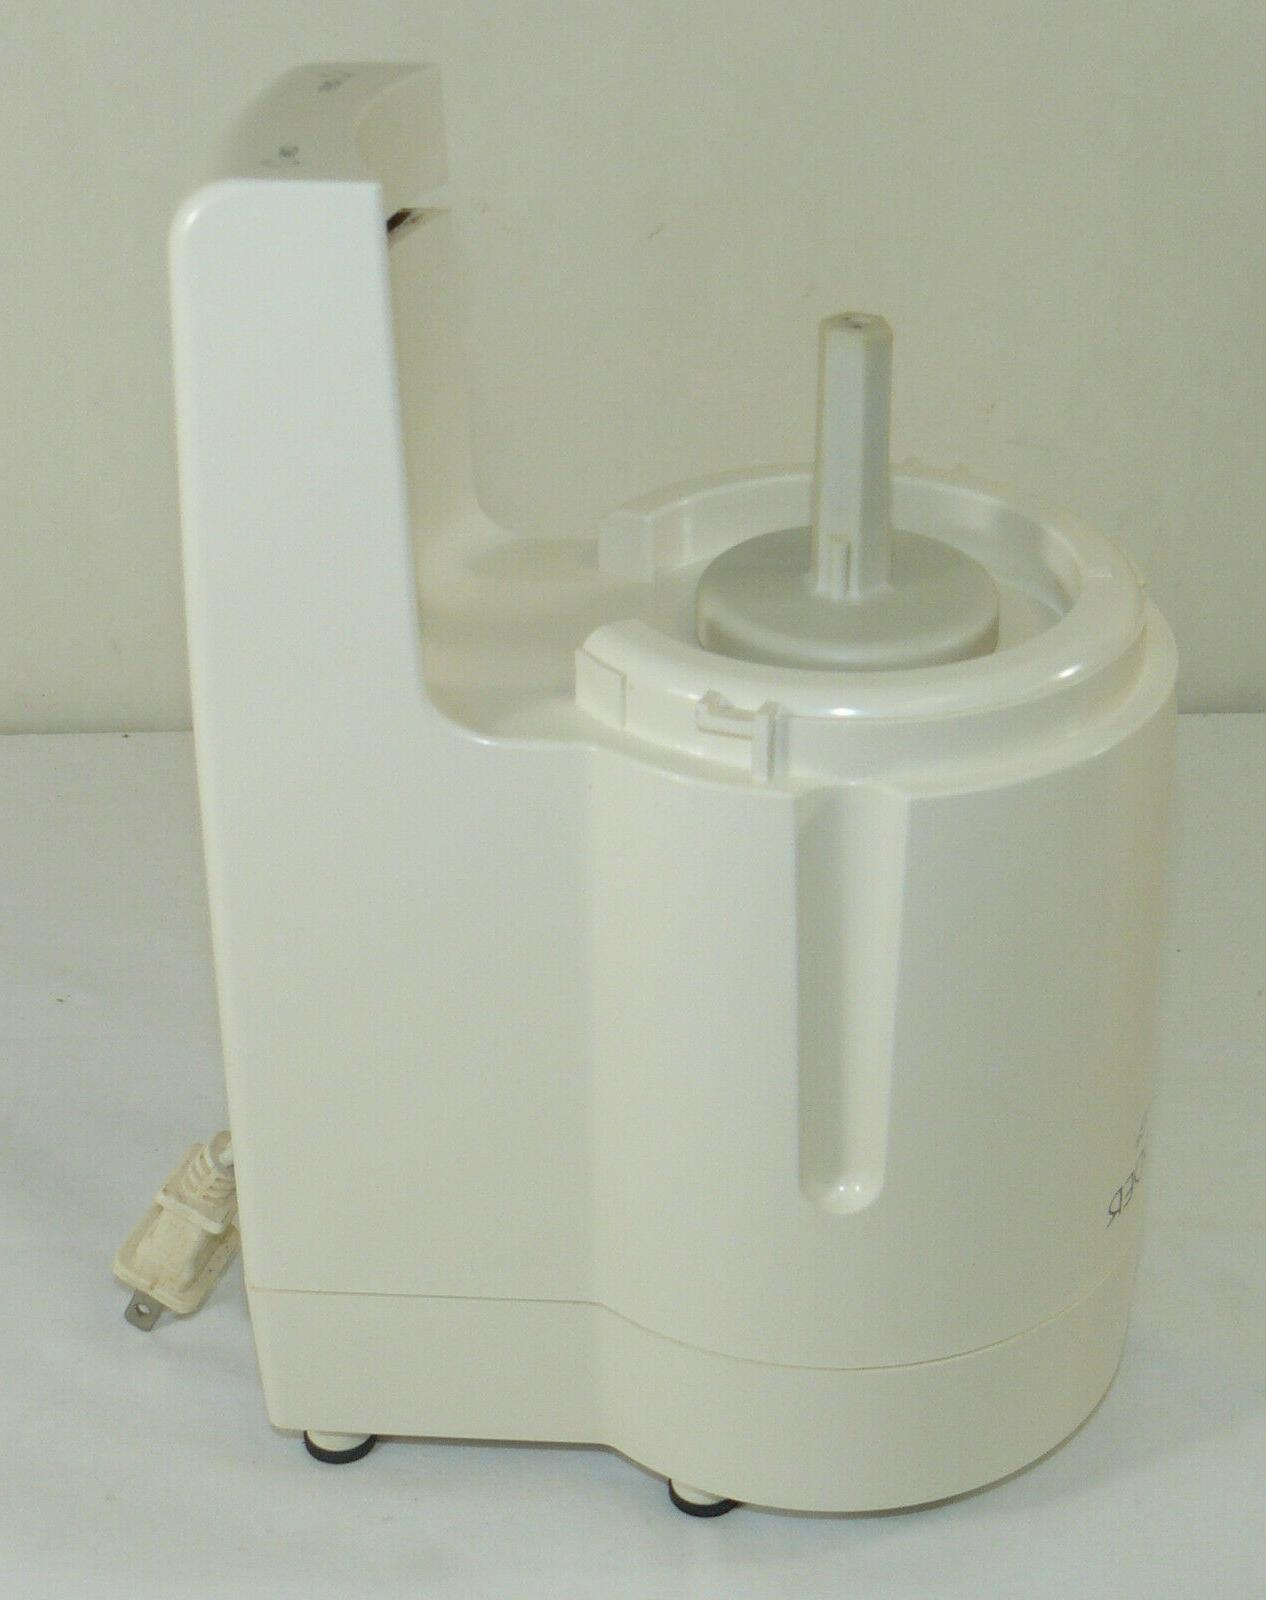 Kenmore Order Processor Model 400.69670 Motor Base